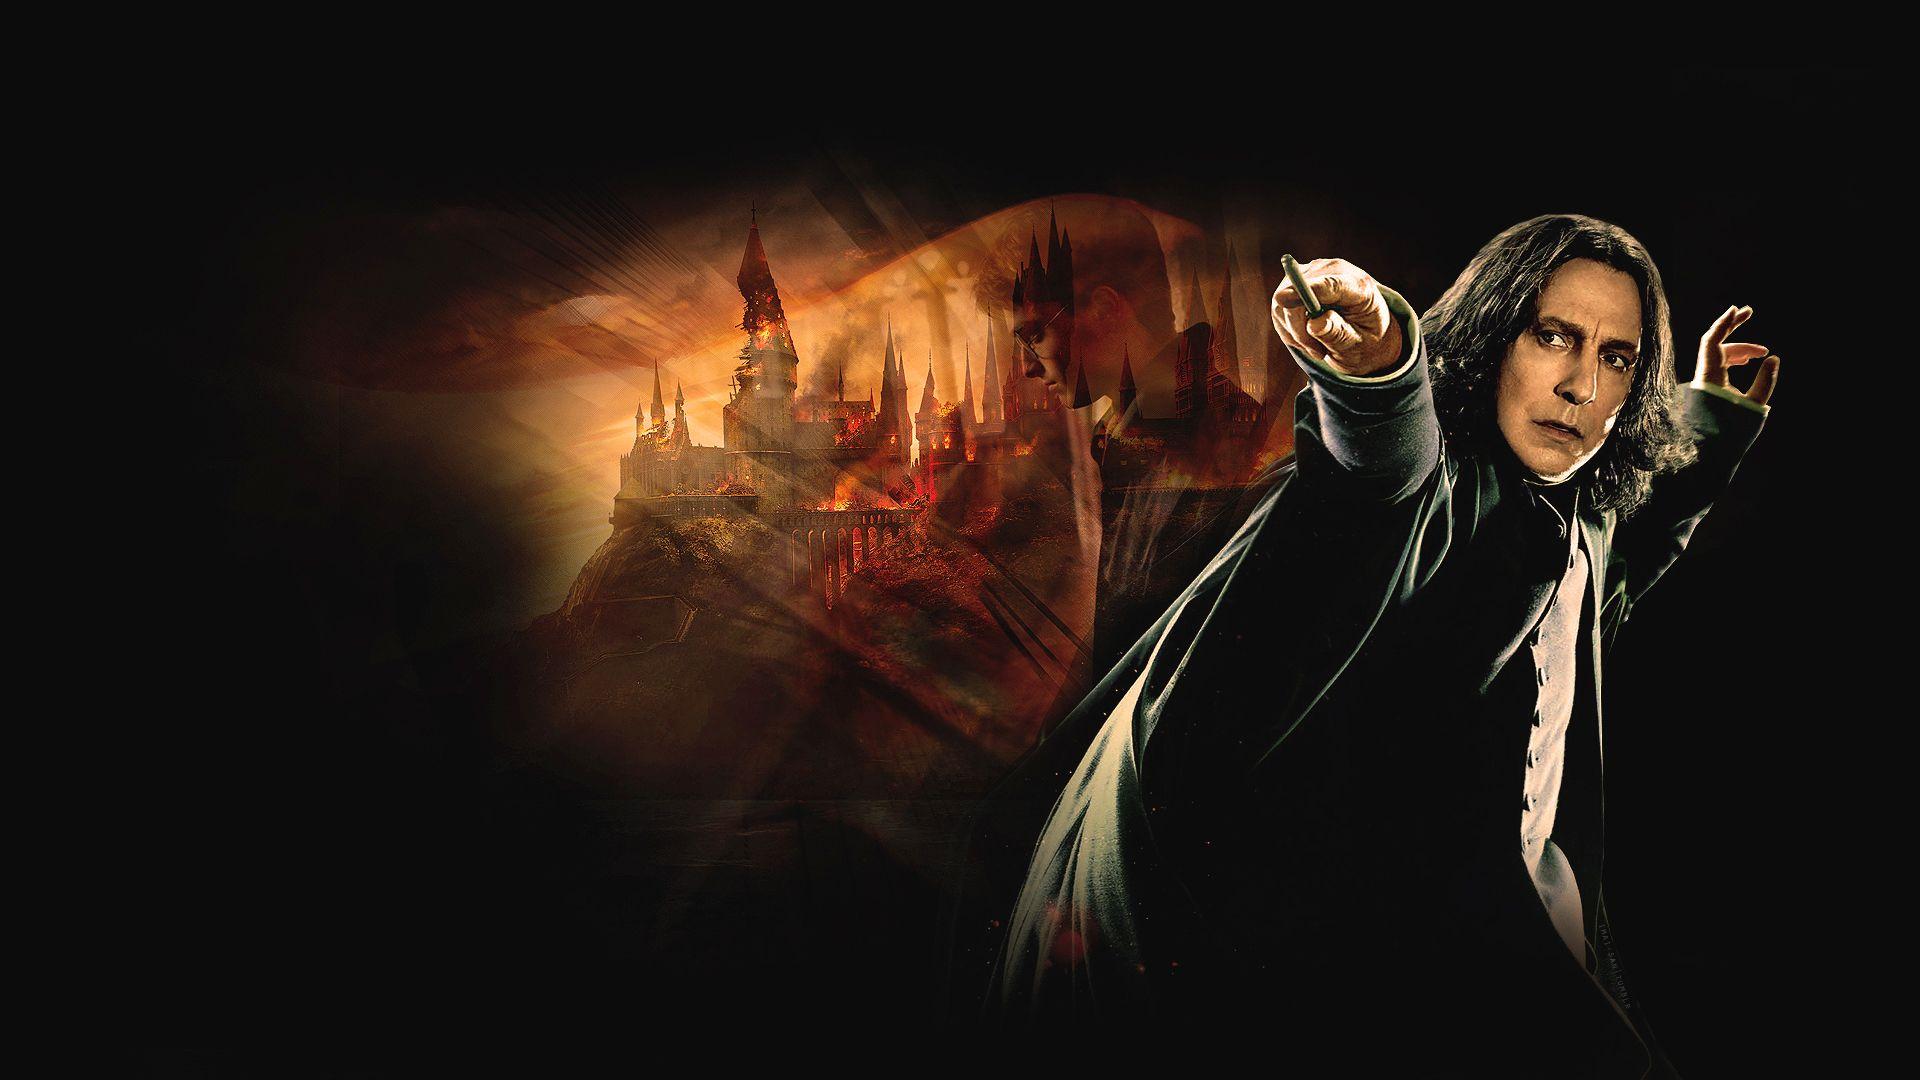 Harry Potter Free Desktop Wallpaper